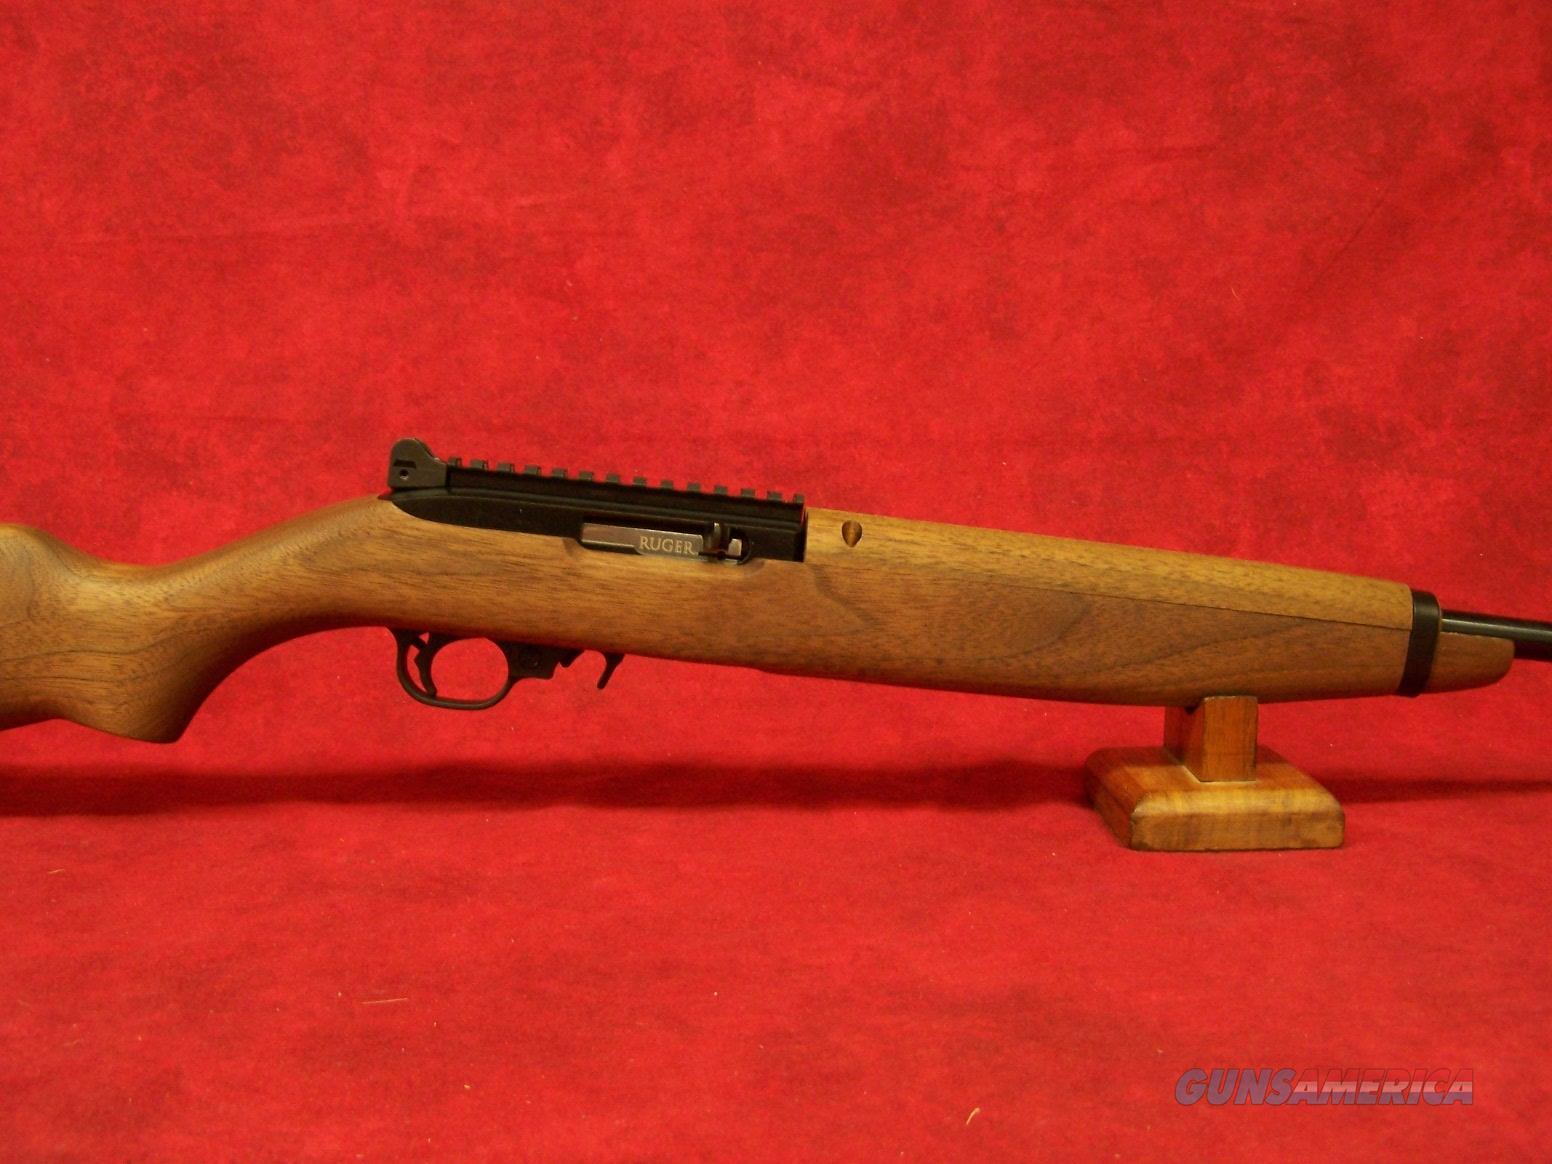 RUGER TALO 10/22 22LR W/ M1 CARBINE STK 15RD (21138)  Guns > Rifles > Ruger Rifles > 10-22